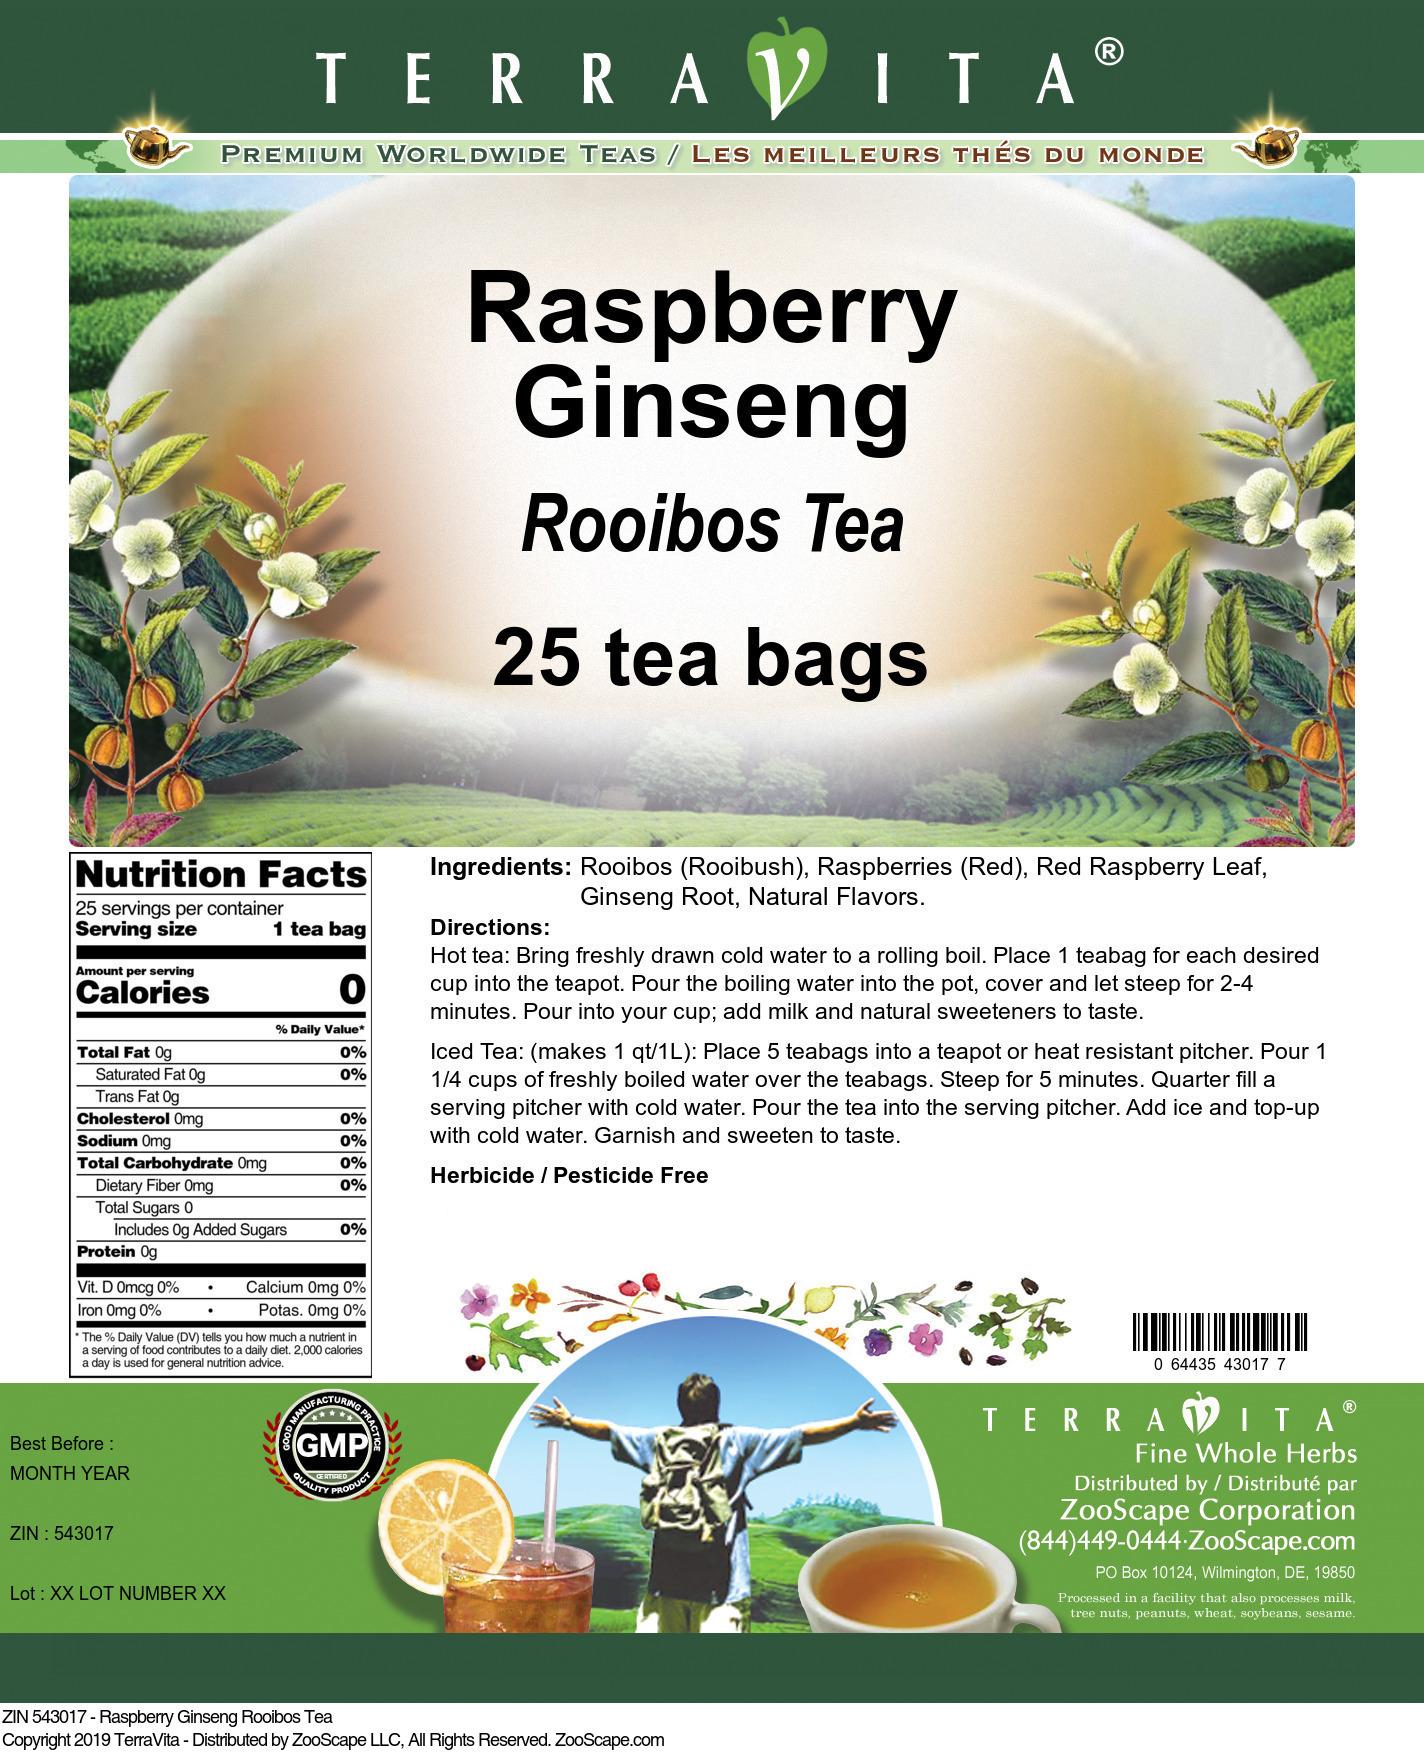 Raspberry Ginseng Rooibos Tea